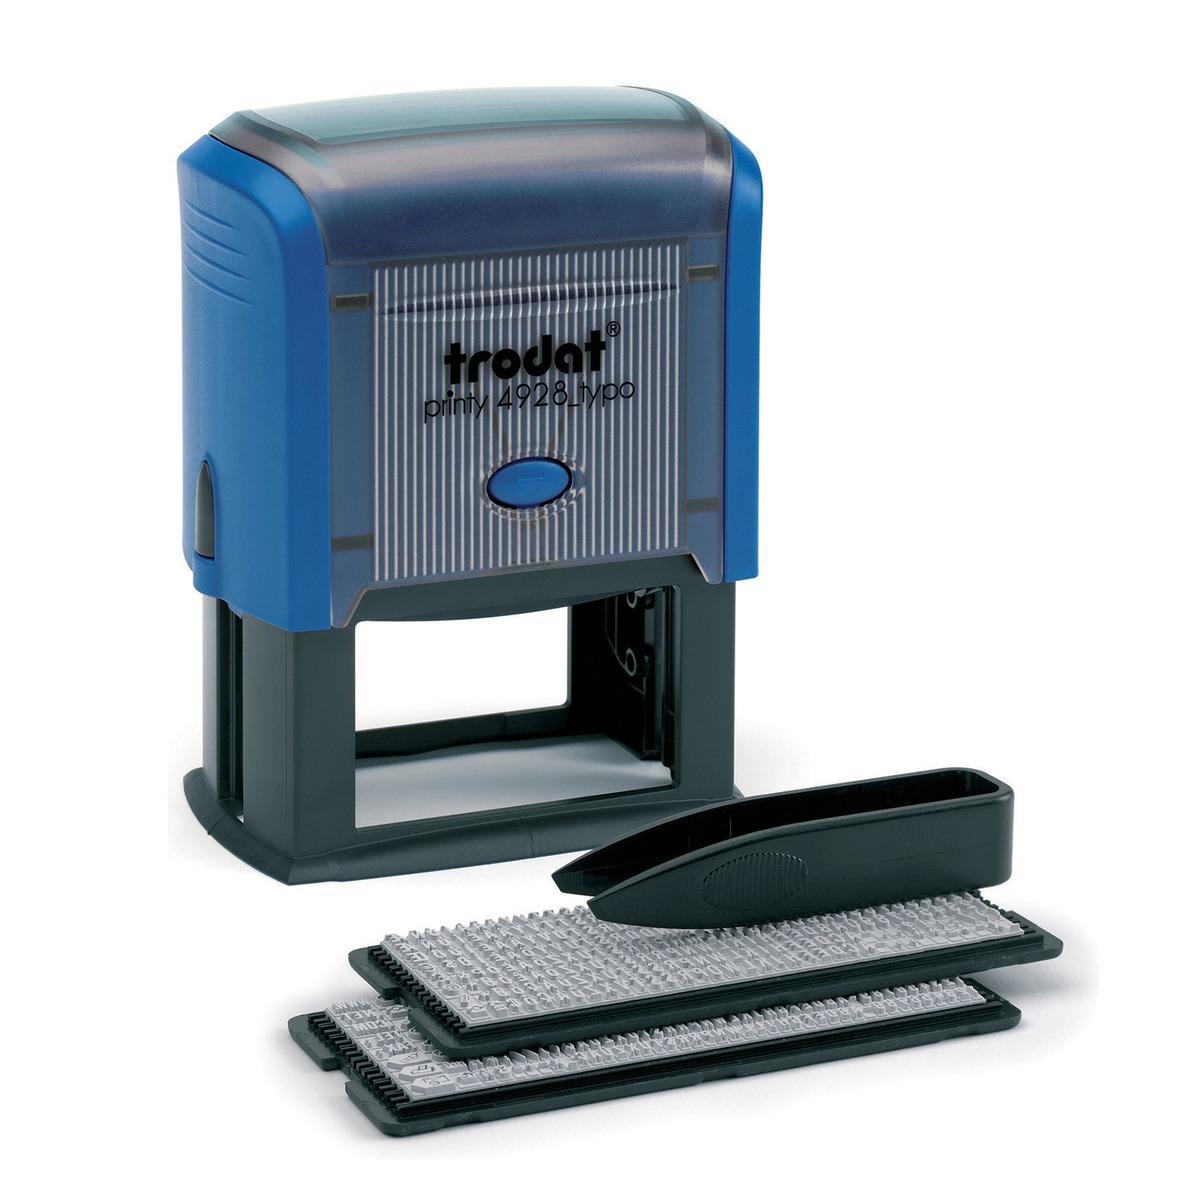 Trodat Штамп самонаборный семистрочный 60 х 33 мм -  Печати, штампы